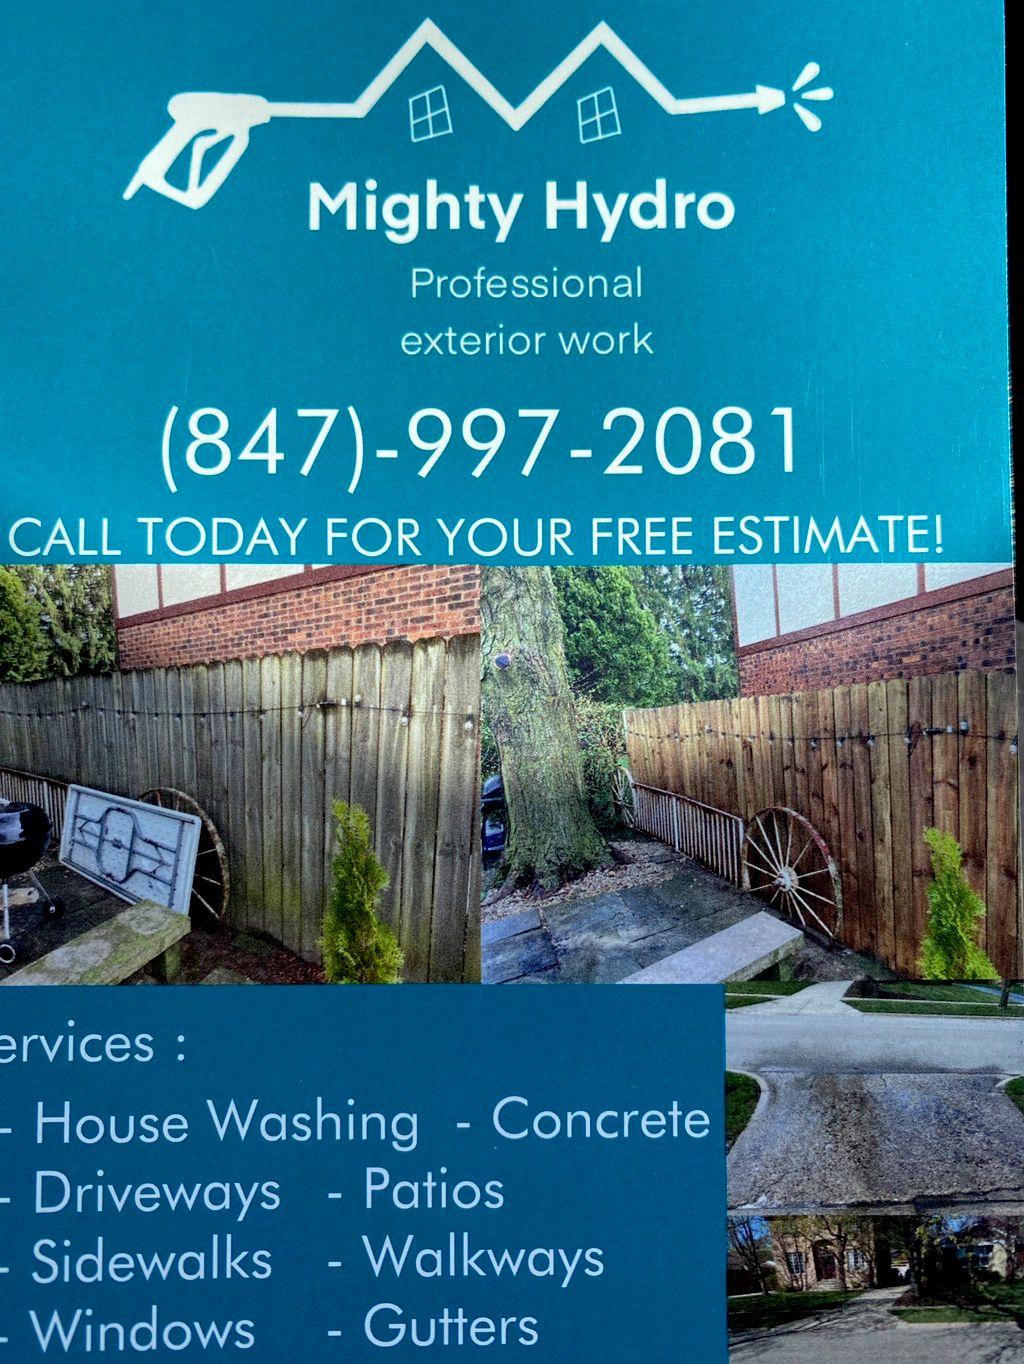 Mighty Hydro Exteriors